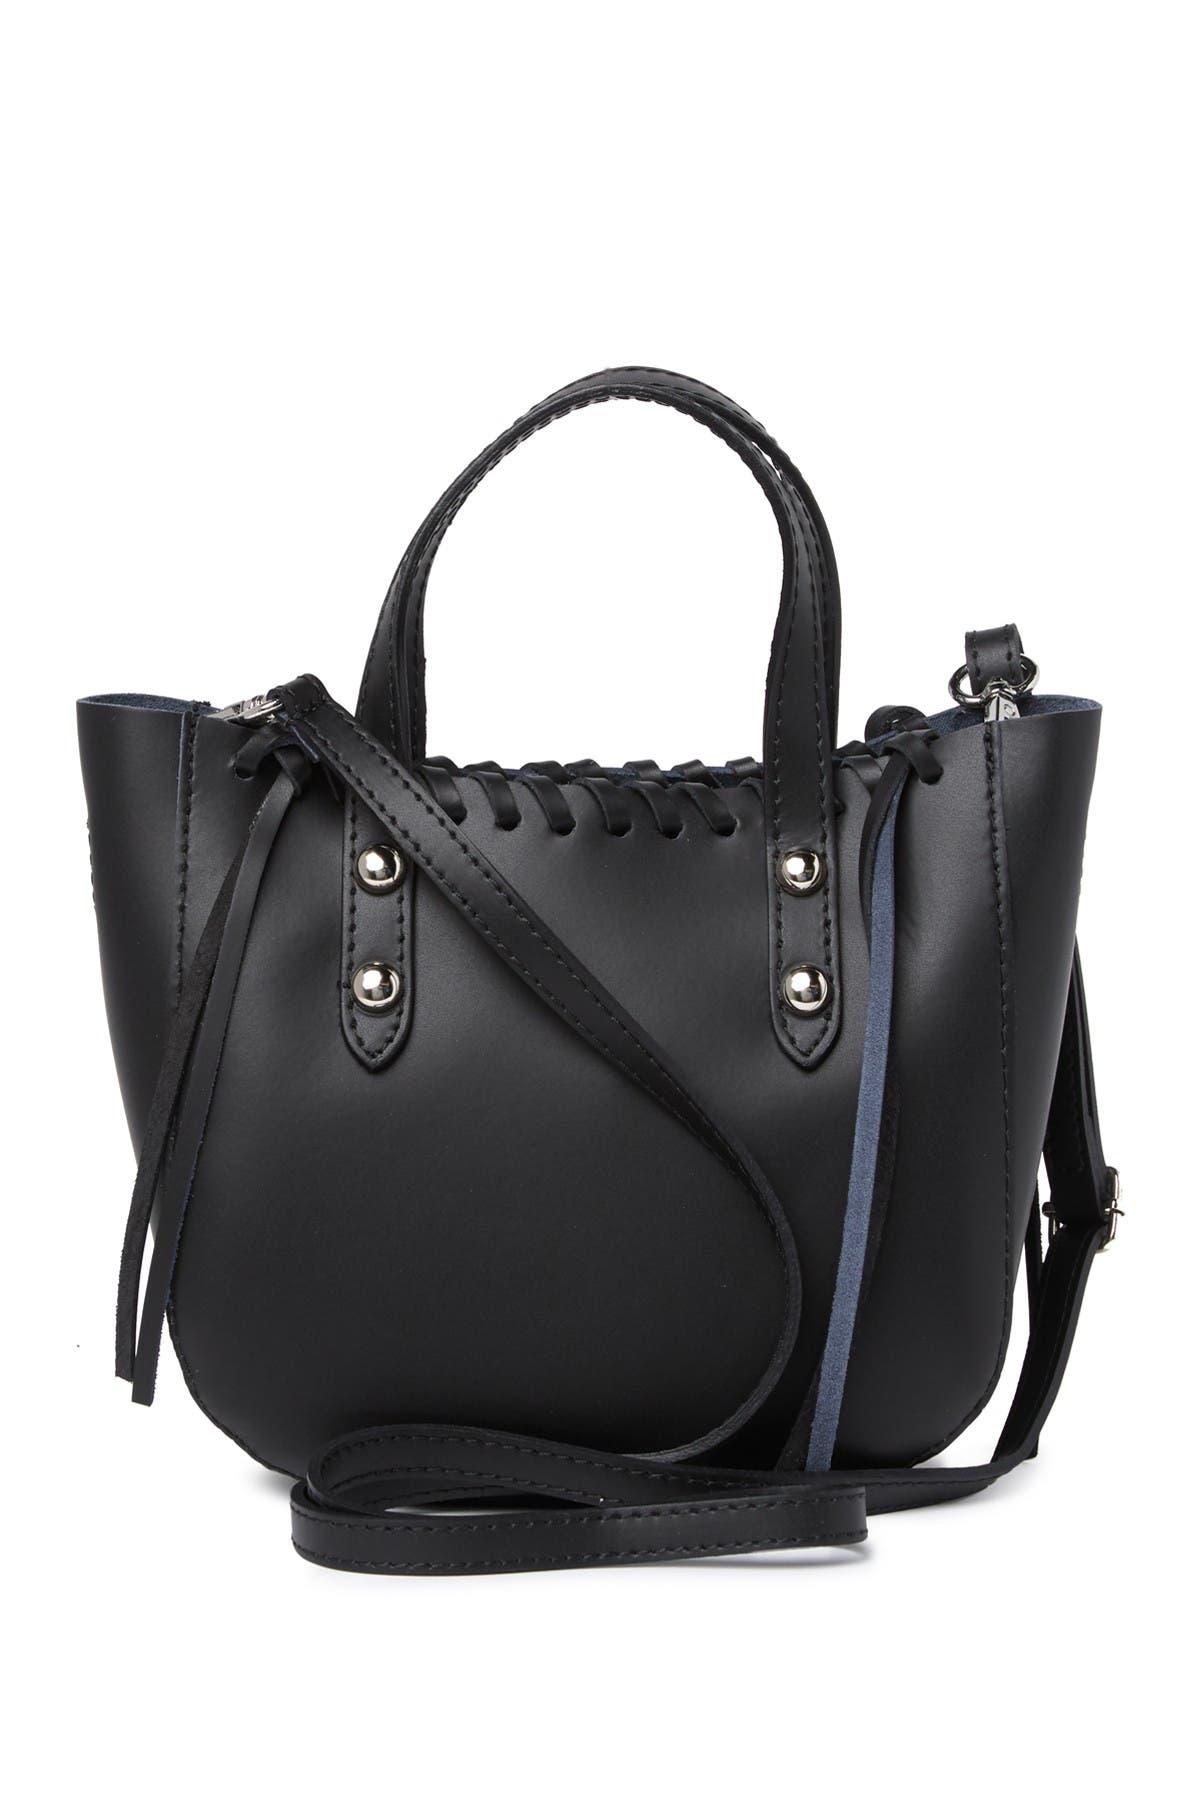 Image of Giorgio Costa Leather Braided Satchel Bag